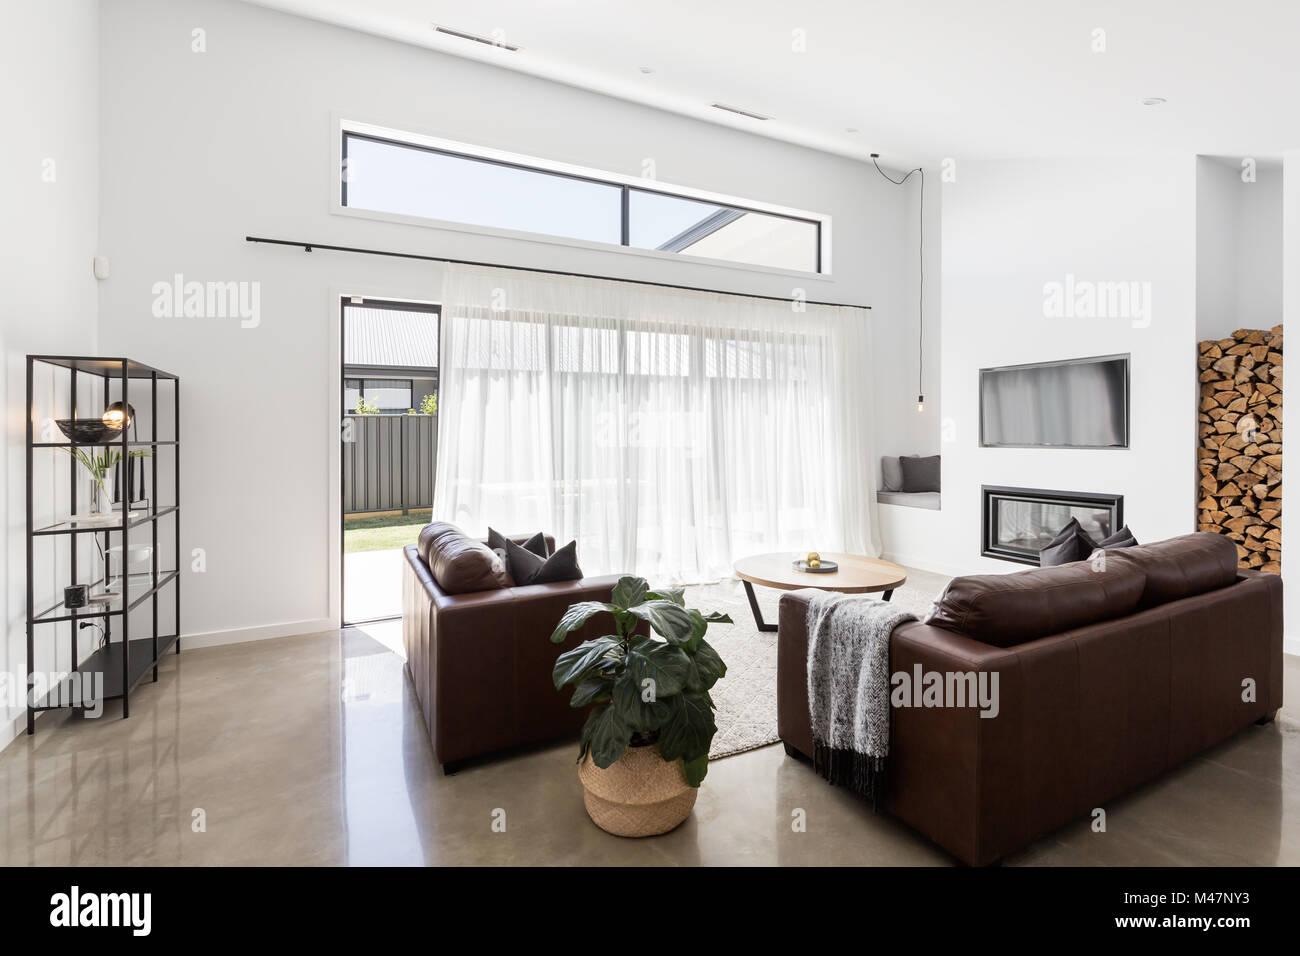 Modern open plan luxury living room with glass sliding doors Stock ...